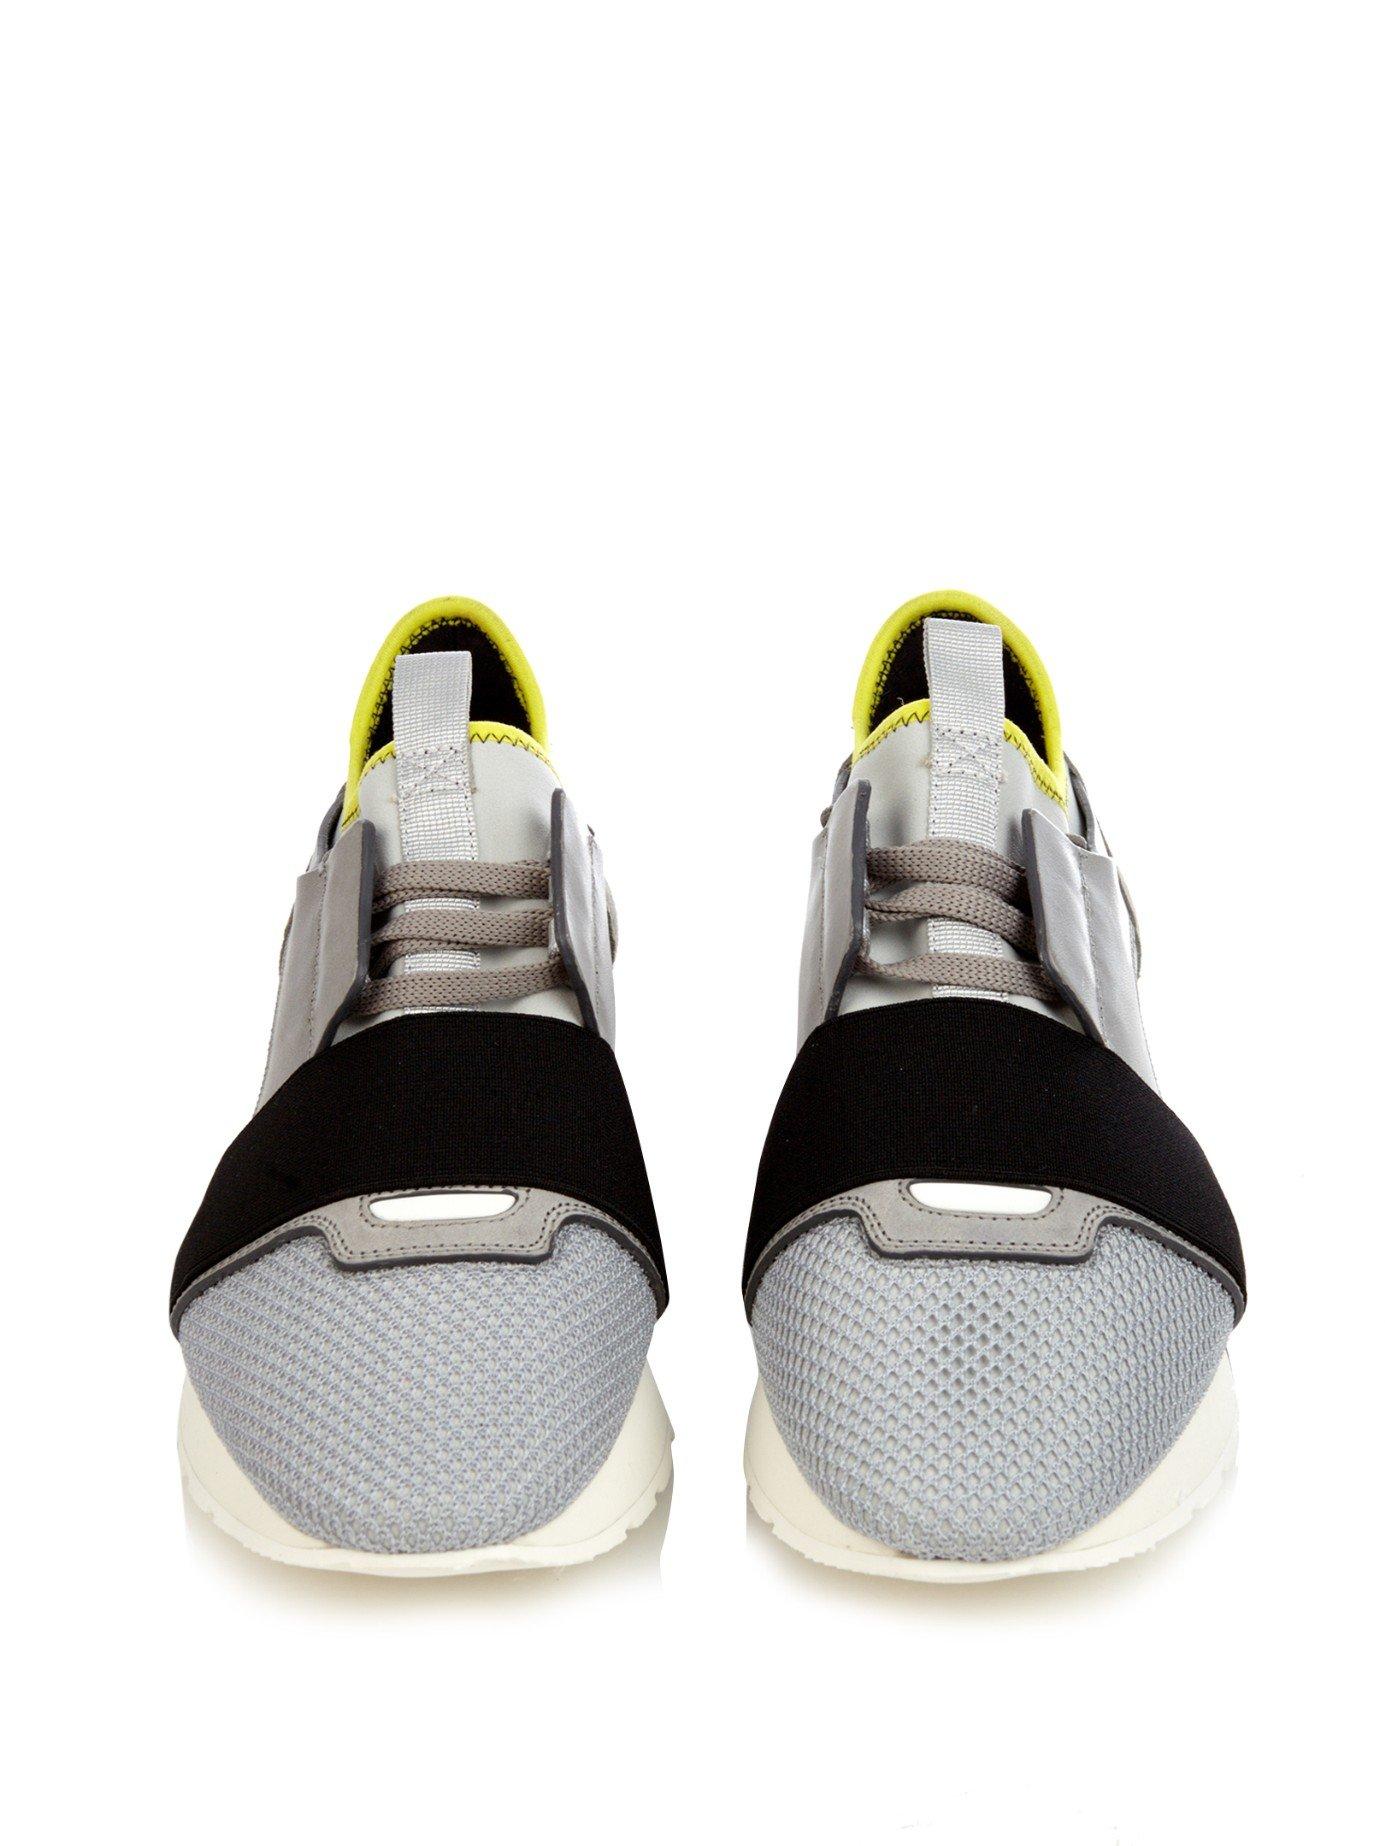 Lyst Balenciaga Multi Panel Low Top Sneakers In Gray